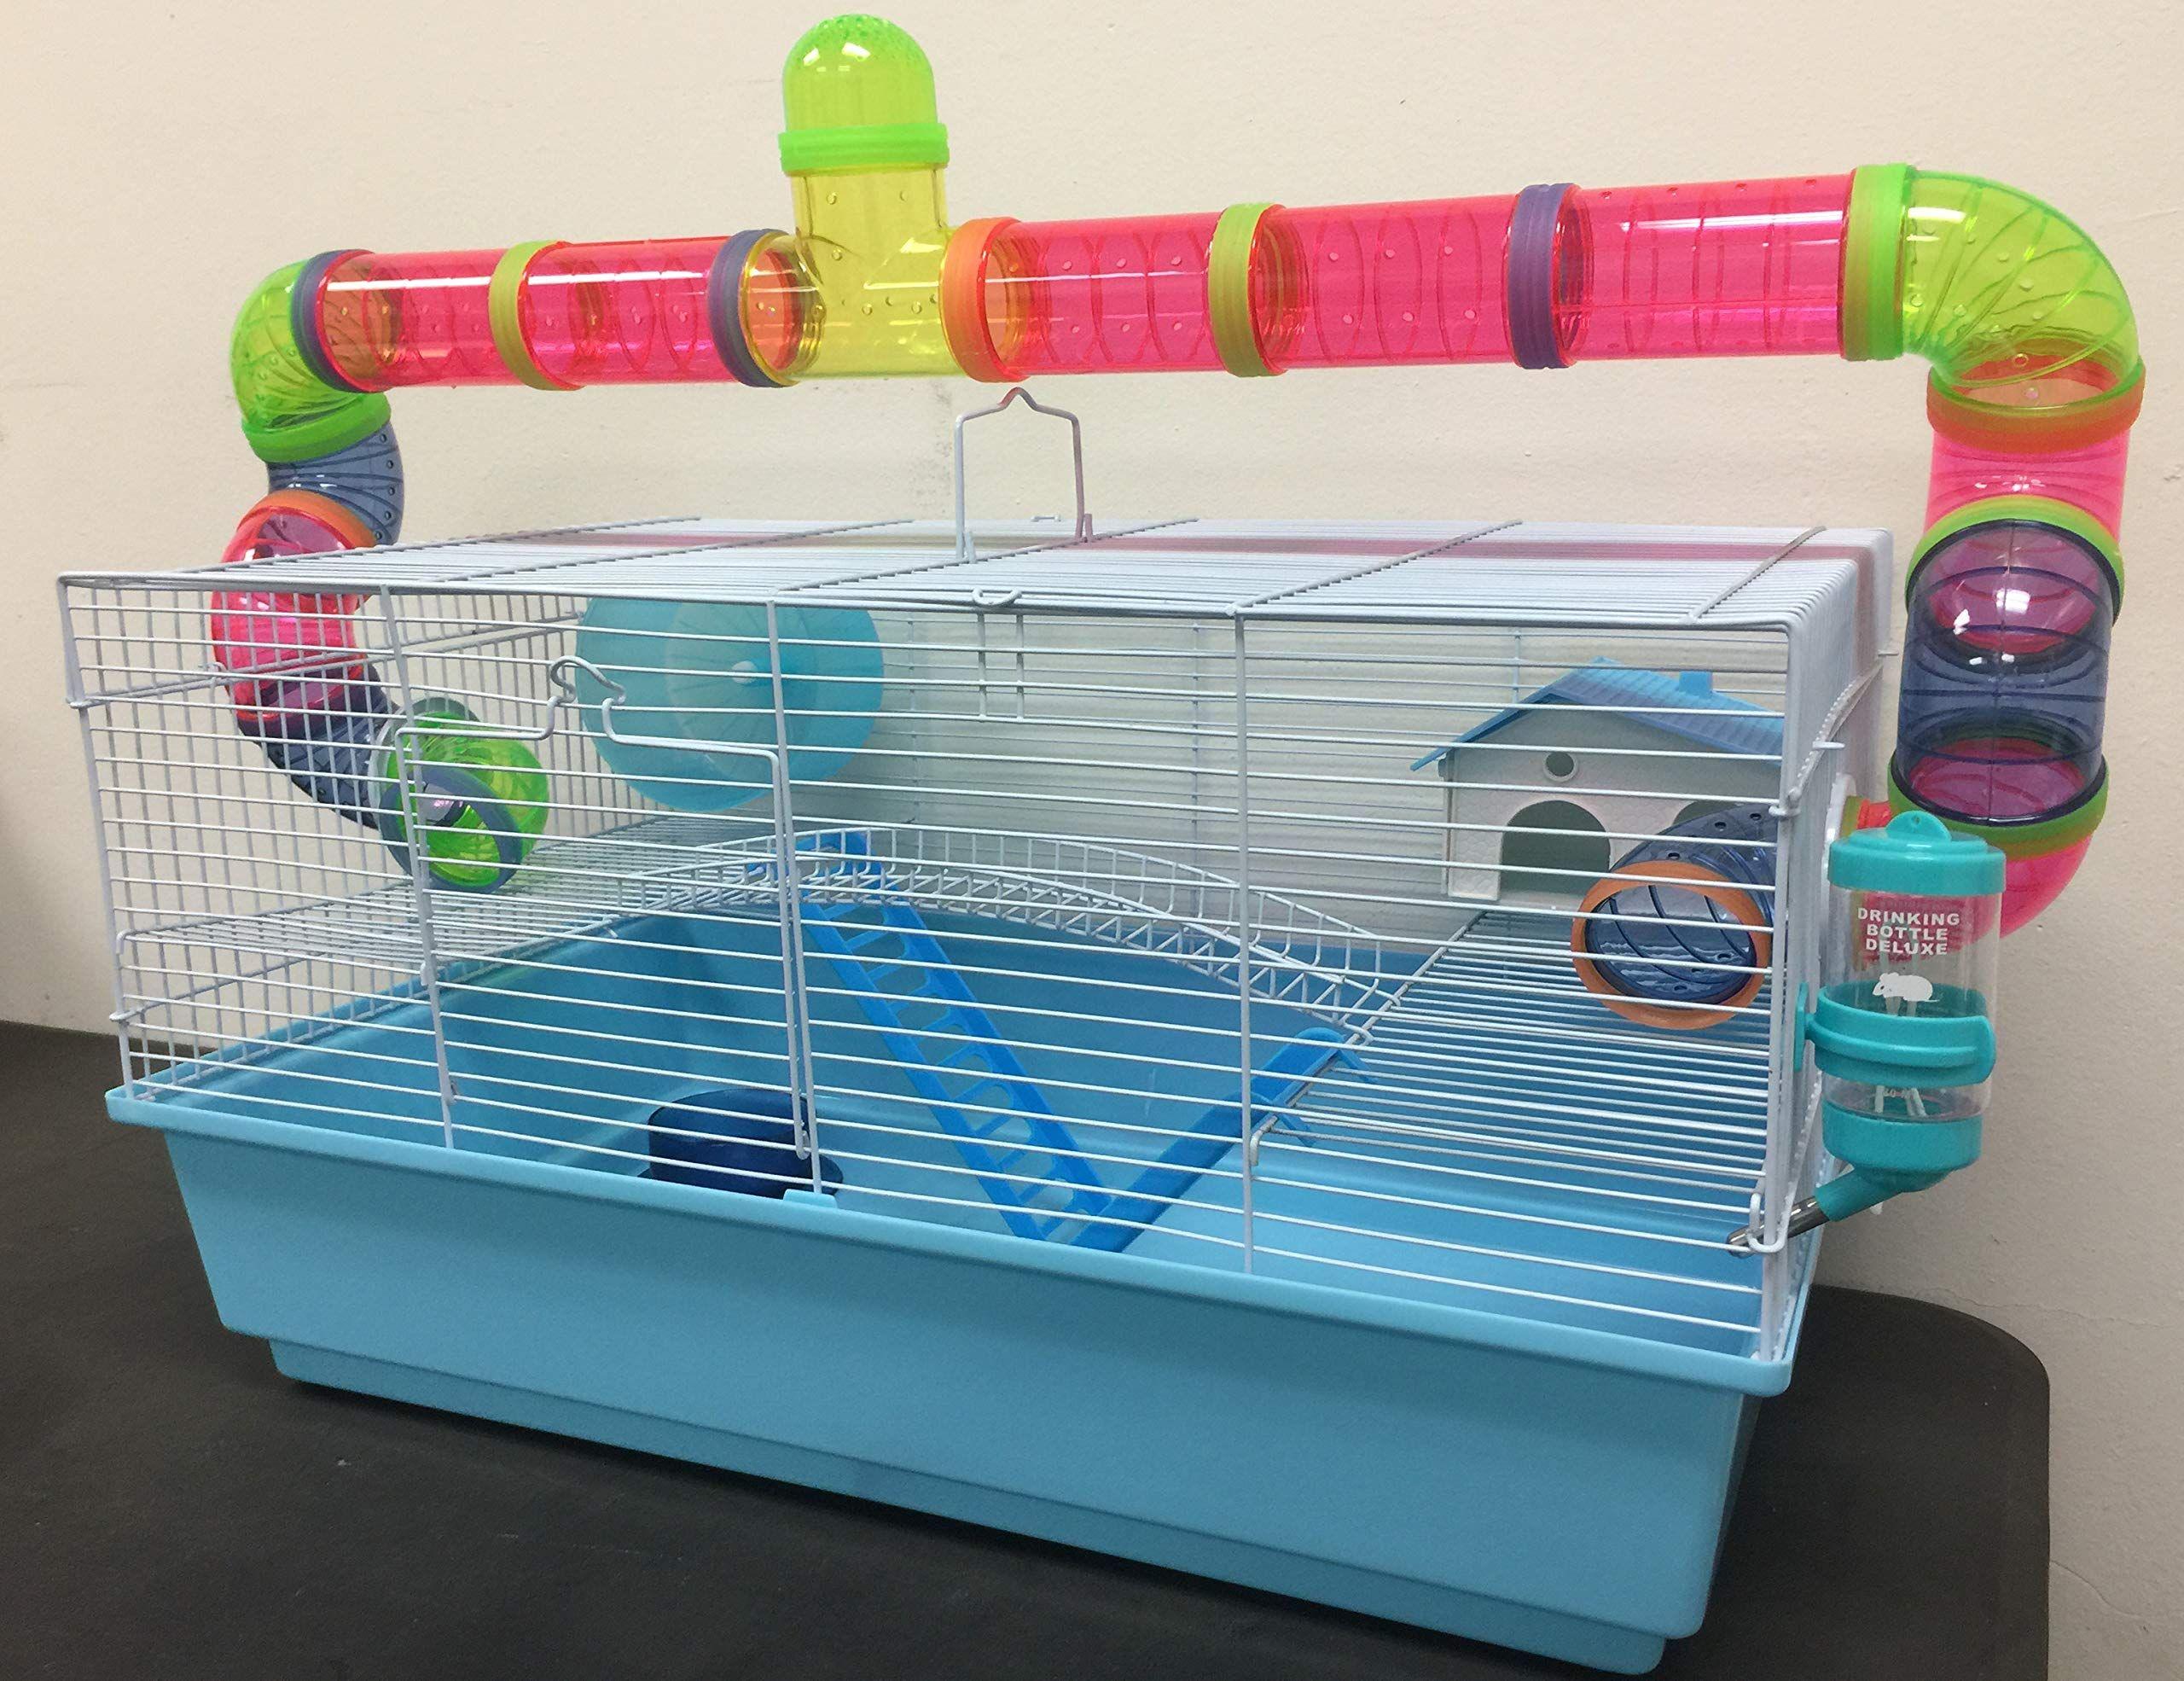 New Large Long Crossing Tube Habitat Hamster Rodent Gerbil Mouse